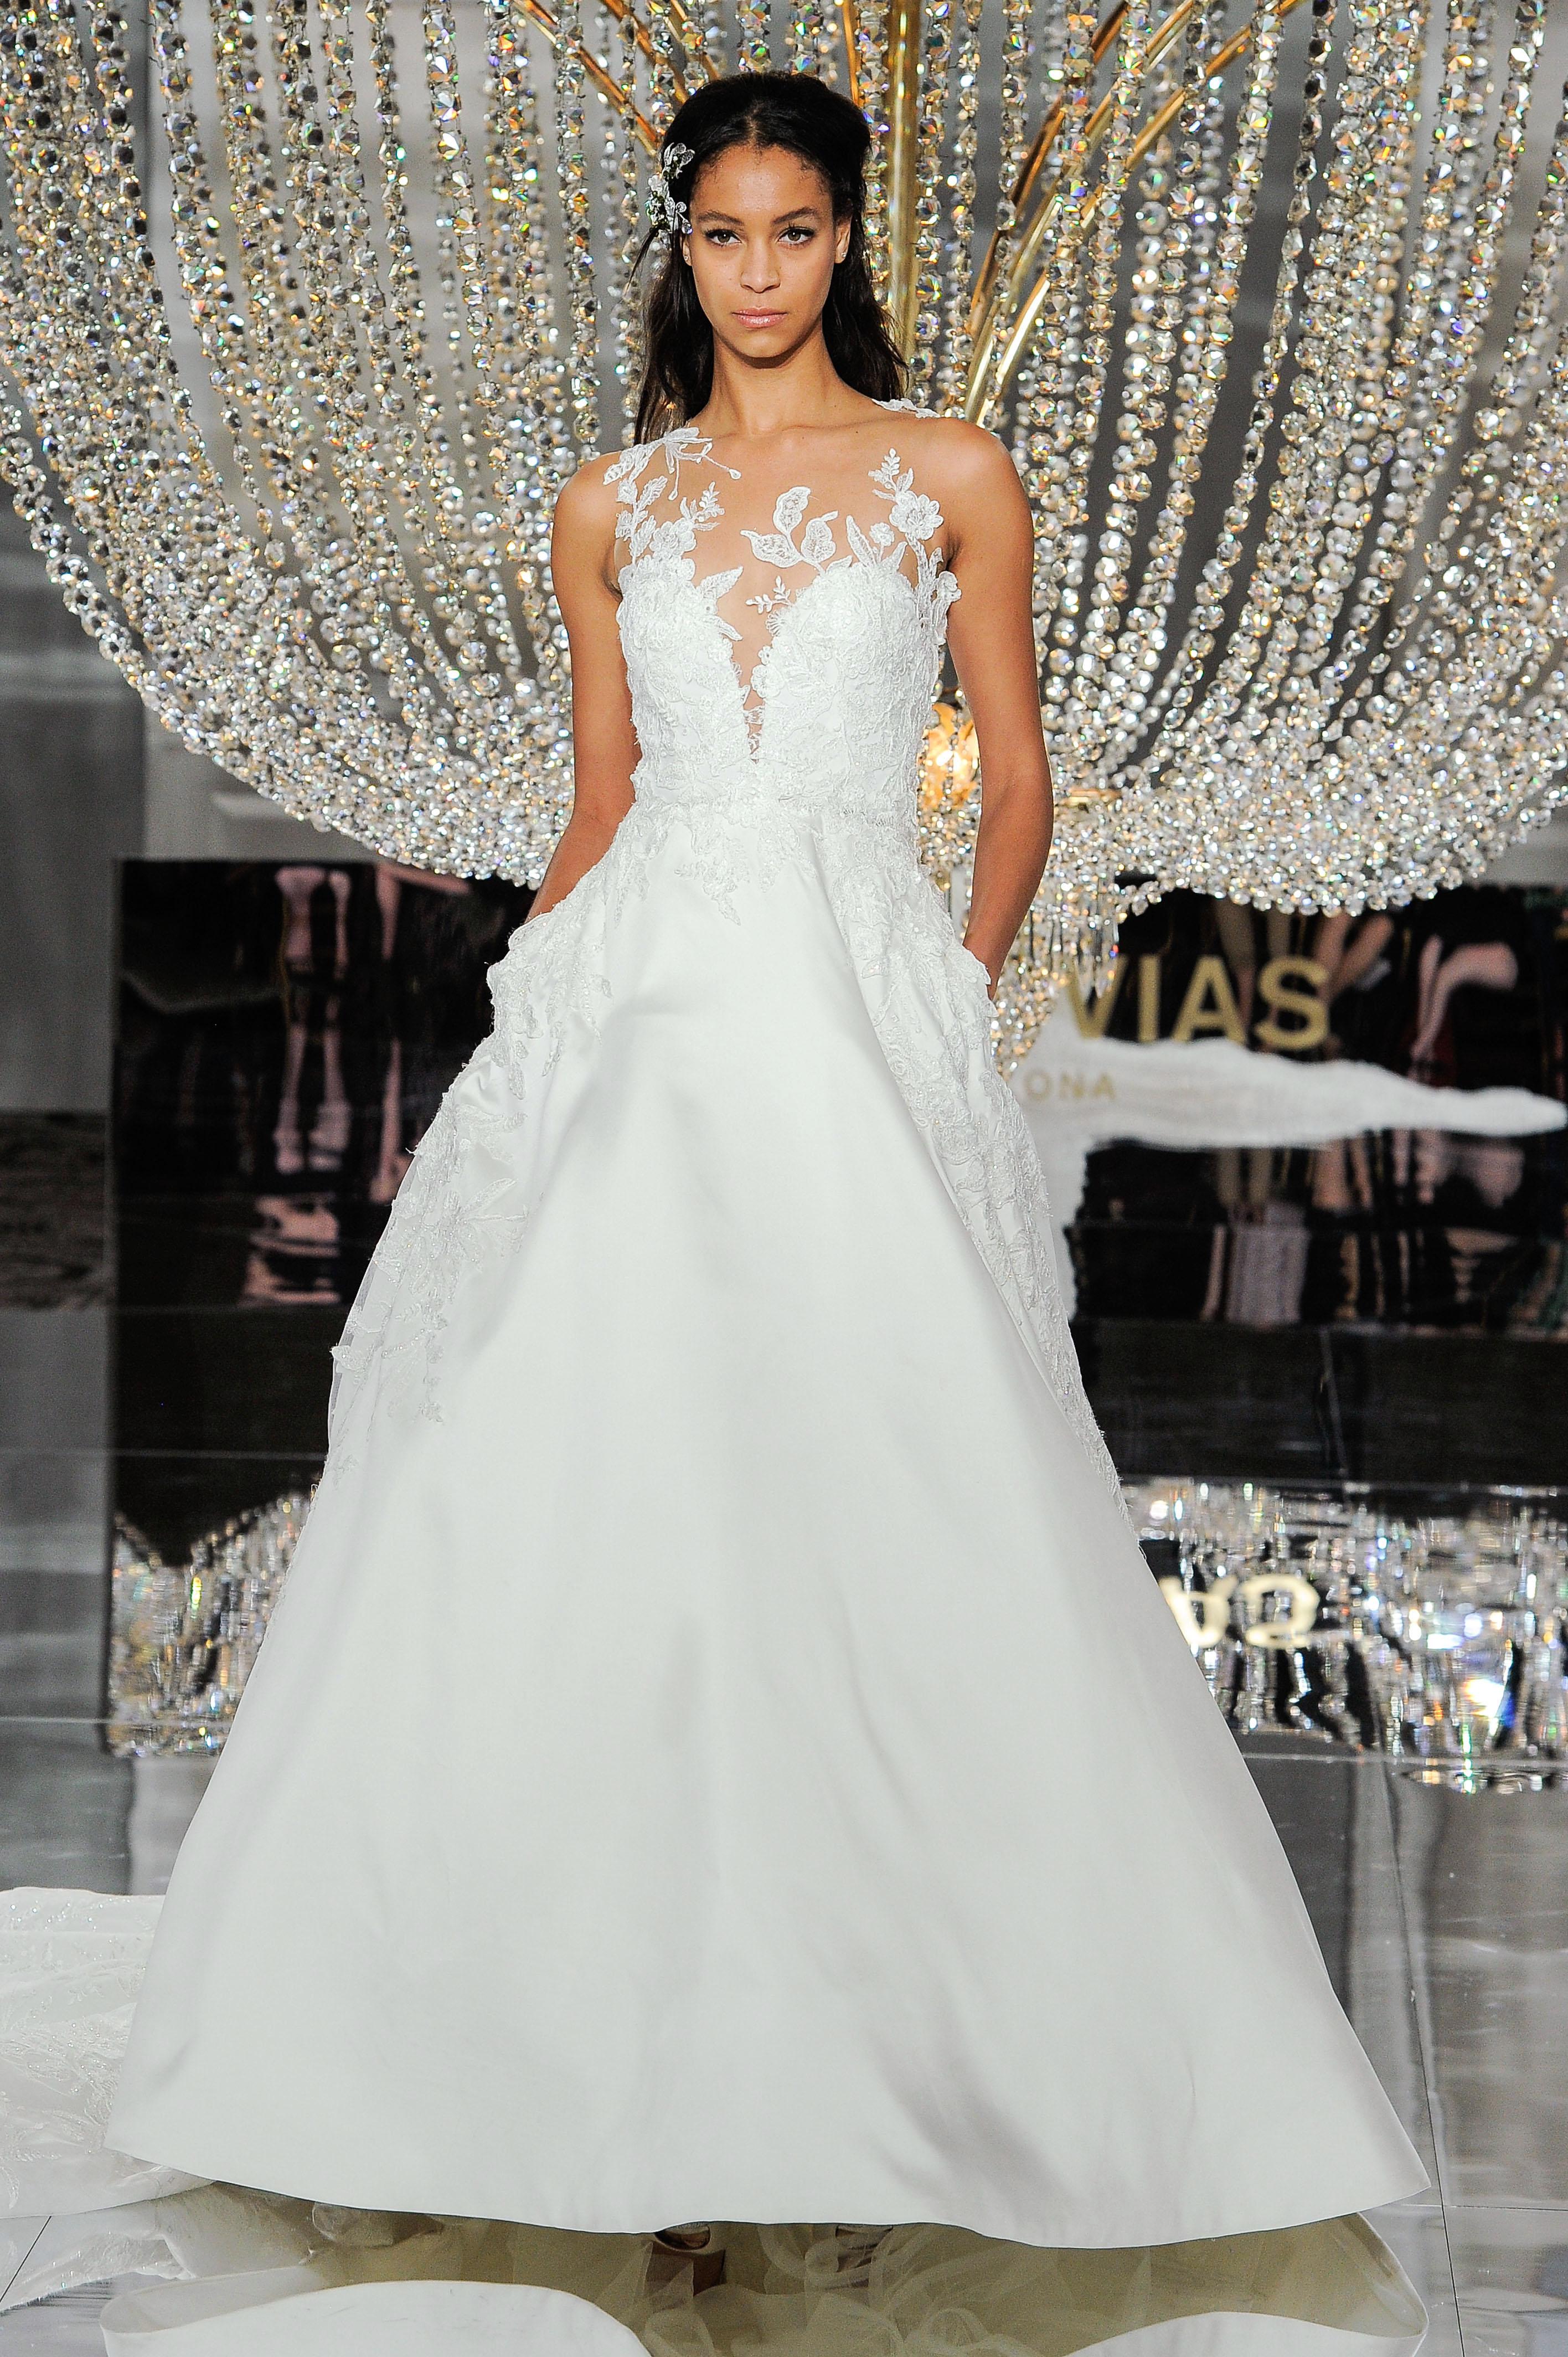 pronovias wedding dress fall 2018 illusion ball gown embellished